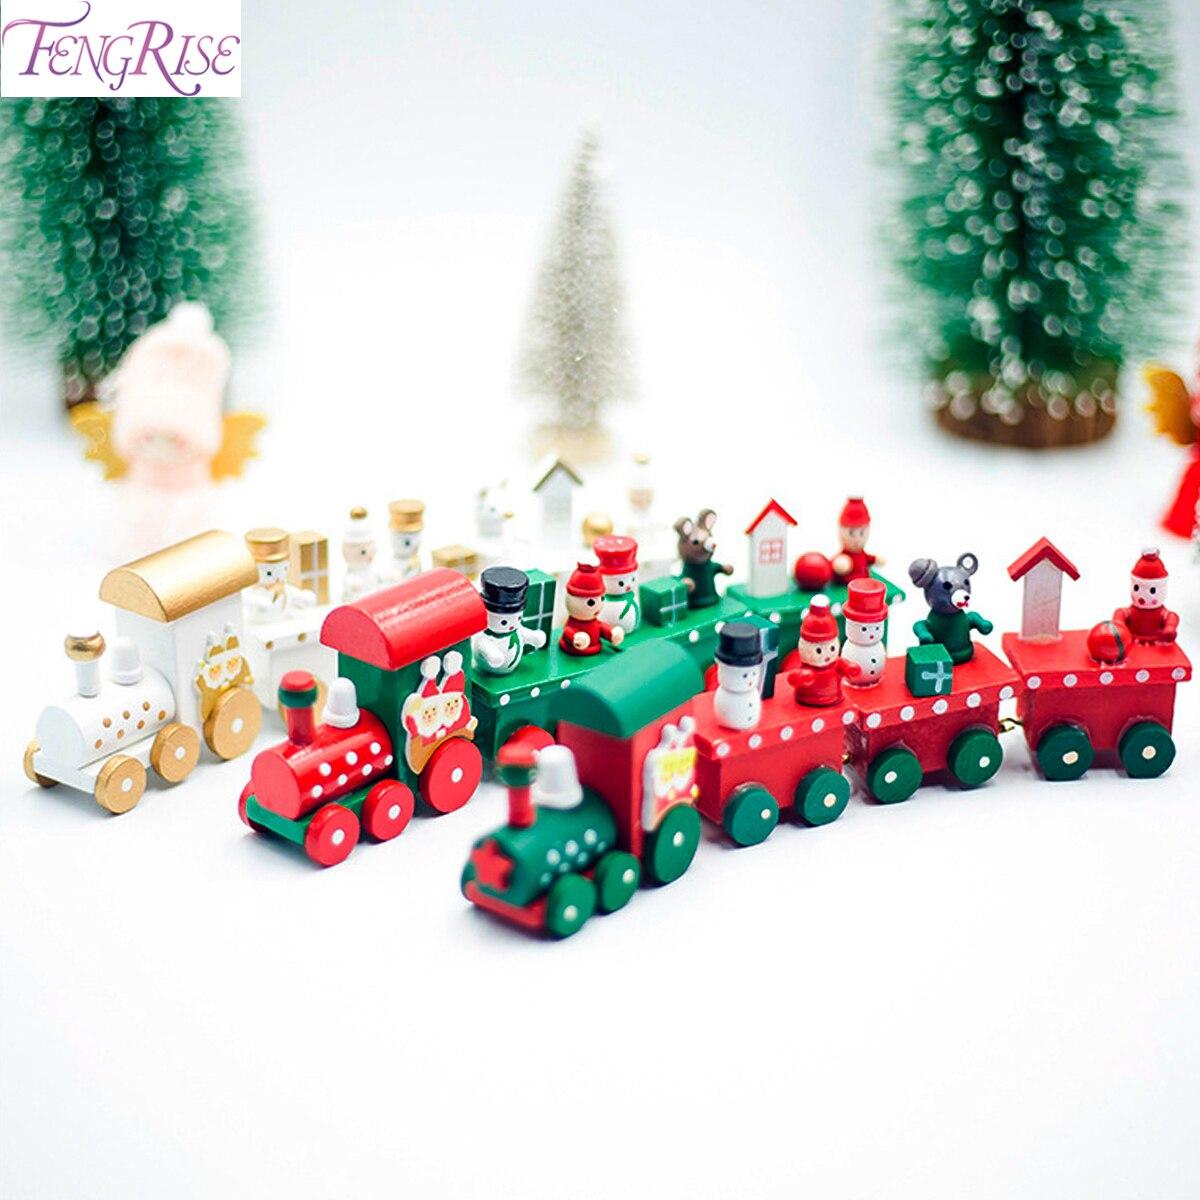 Tren de madera de Navidad, colgantes de Navidad, adornos colgantes de Navidad, decoración de árbol de Navidad, Navidad 2020, decoración de Navidad para el hogar